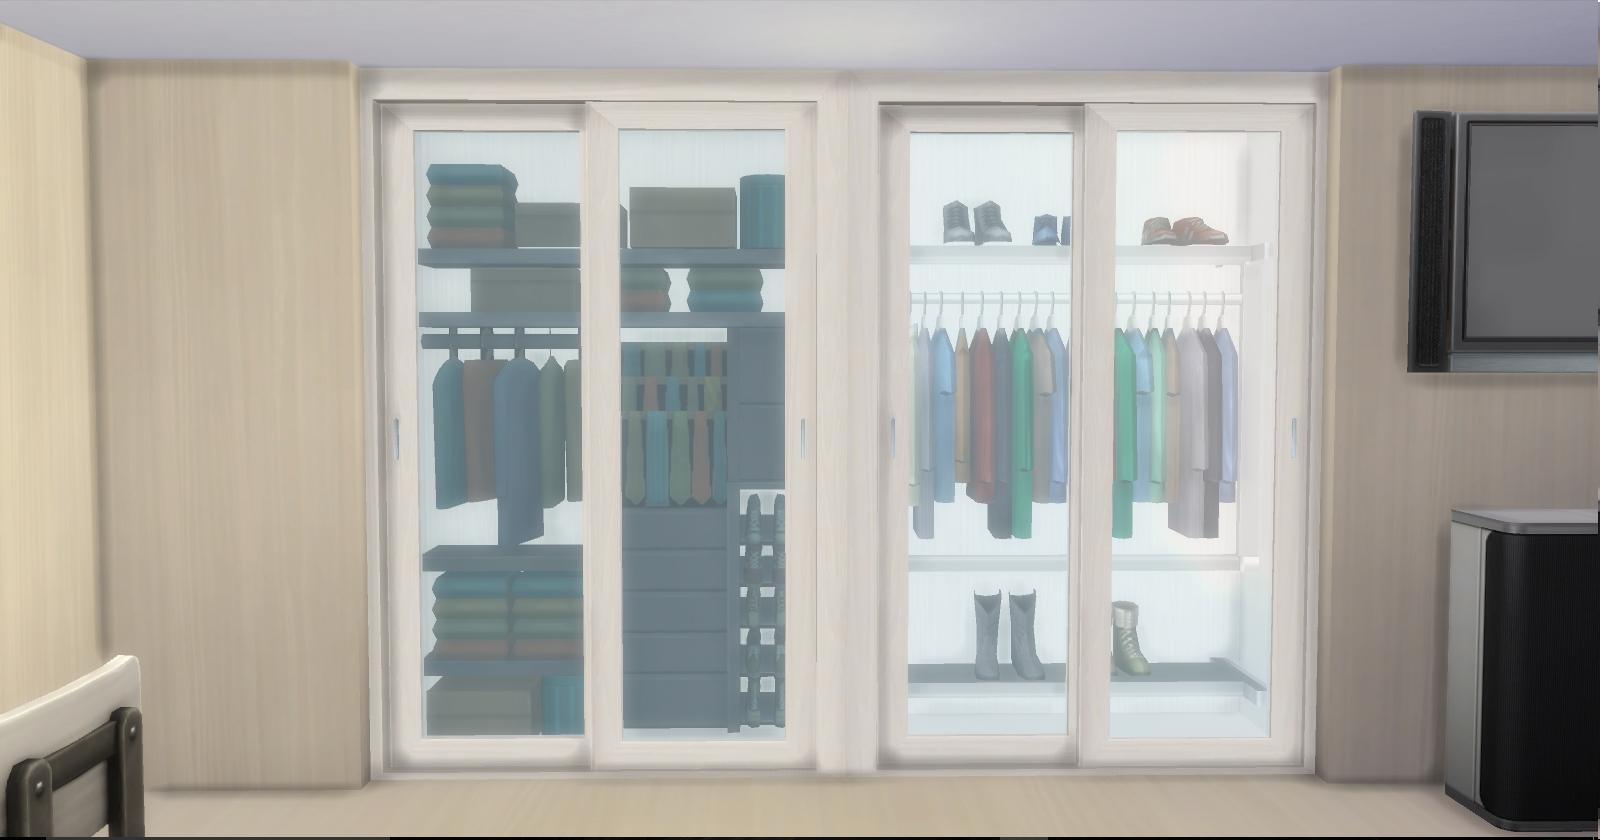 Mod The Sims Display Wardrobe